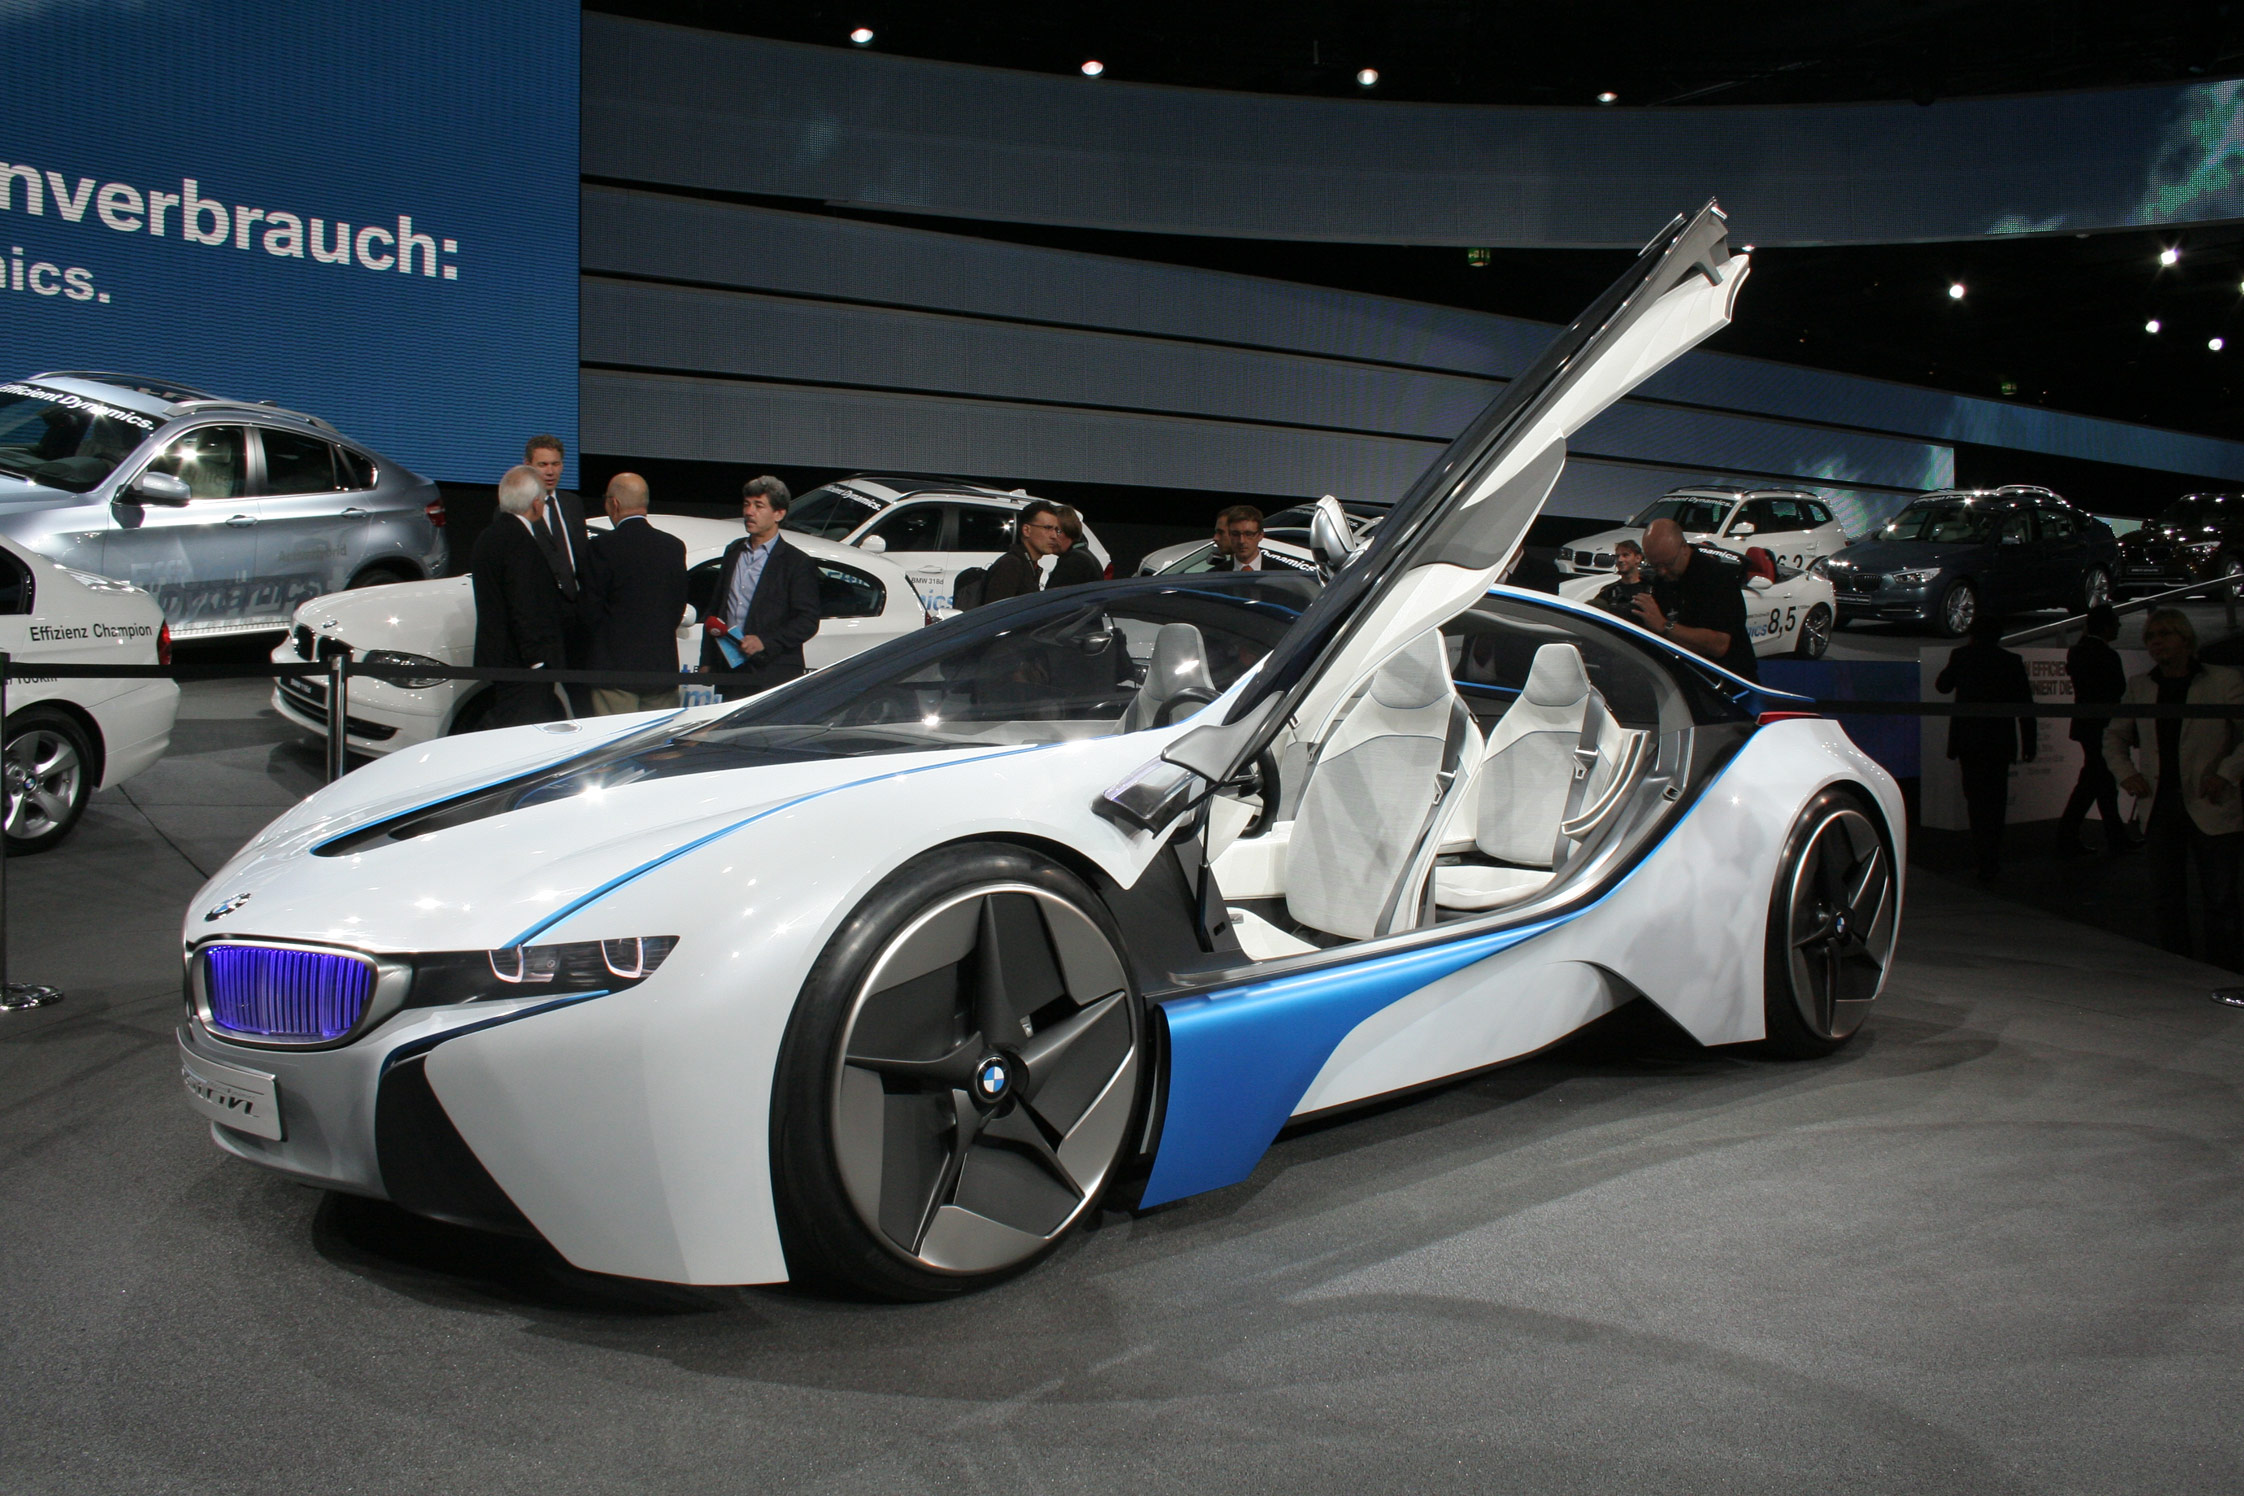 Bmw X3 Efficientdynamics Concept (50 Images) - HD Car Wallpaper